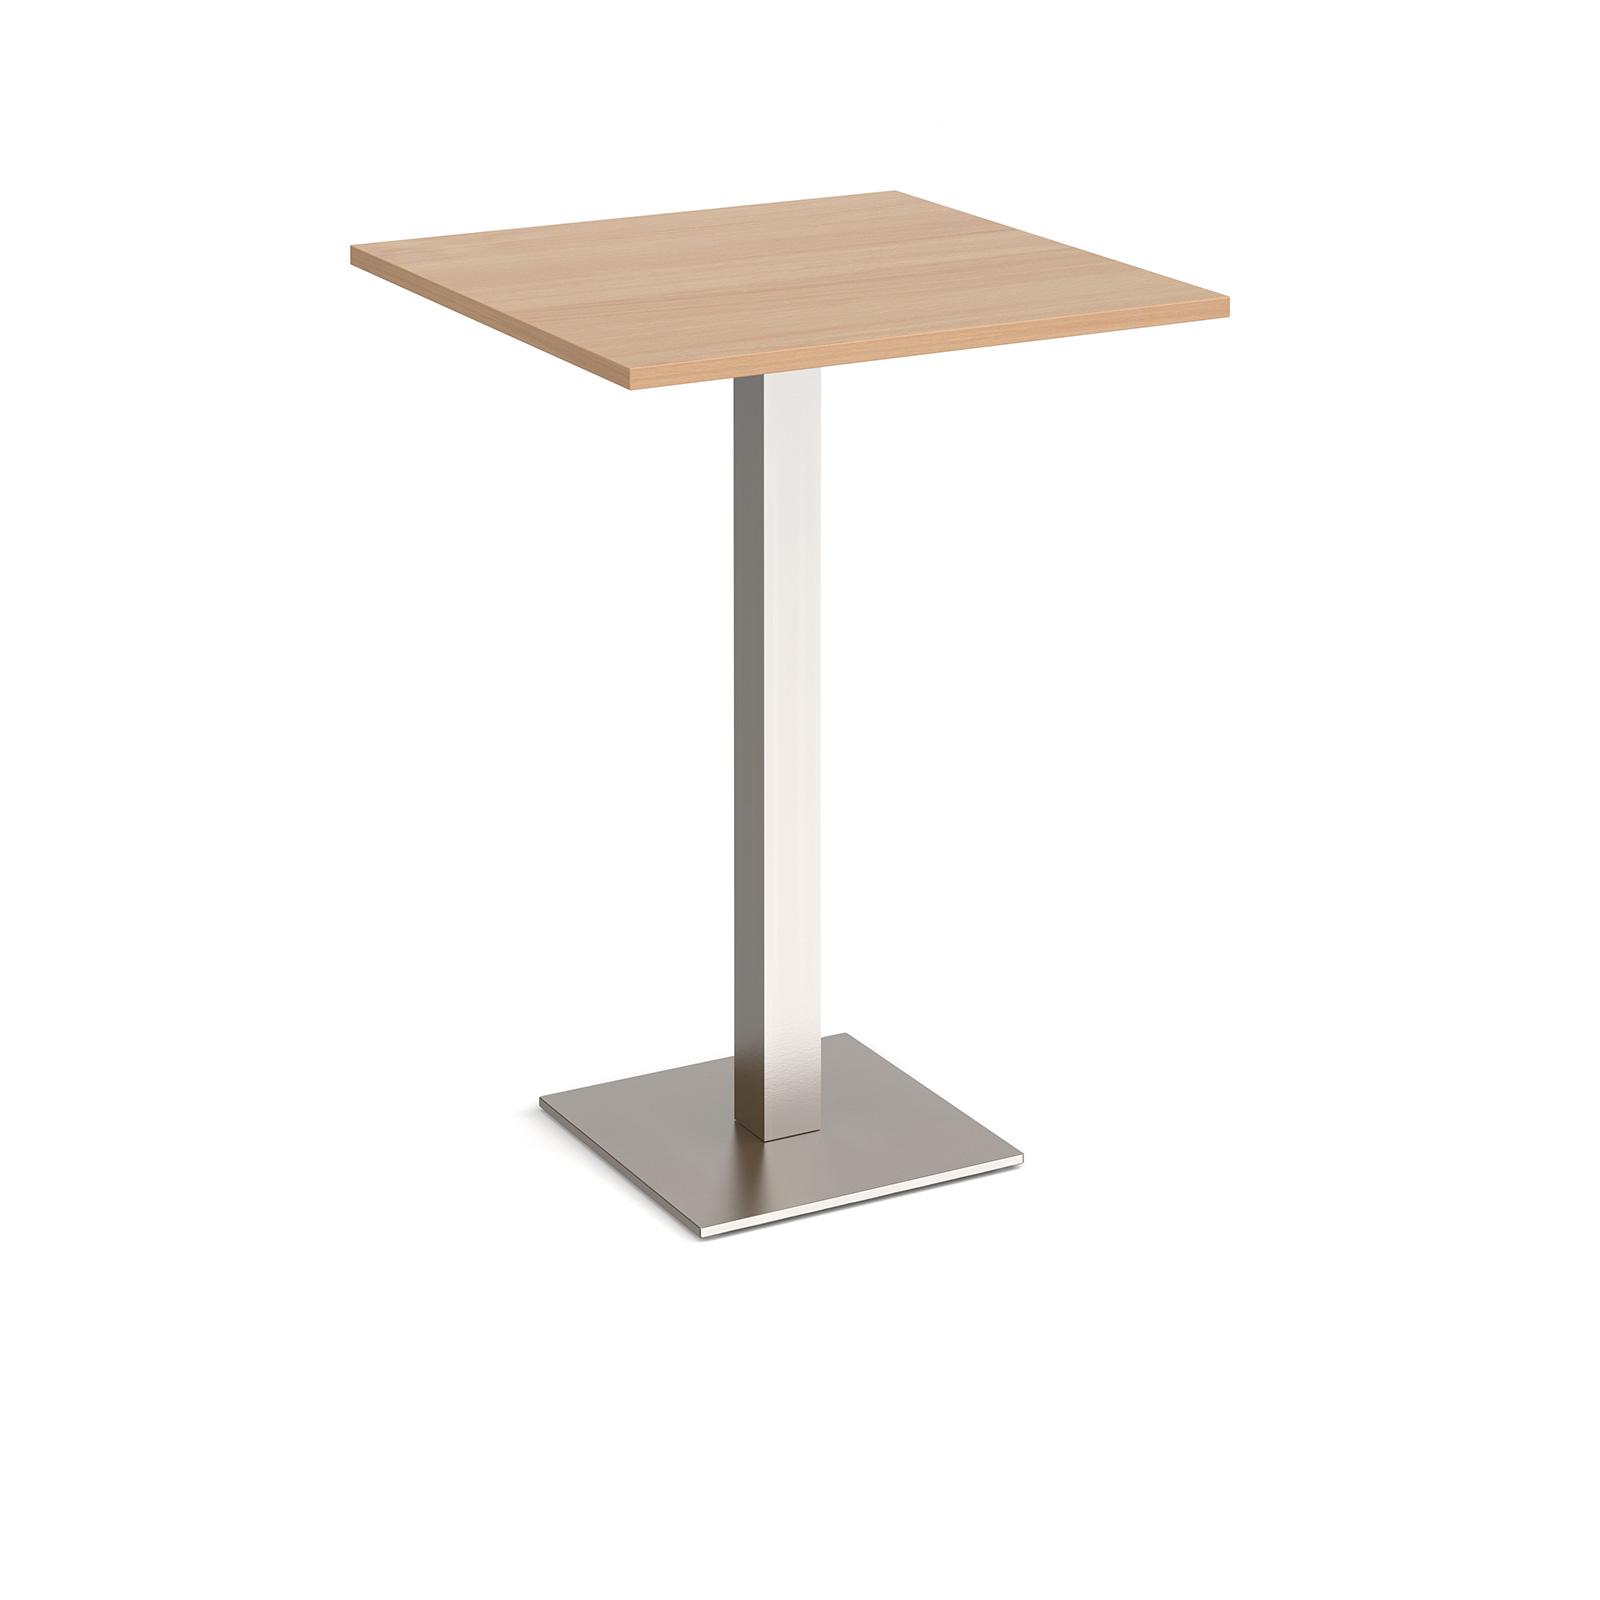 Brescia square poseur table with flat square base